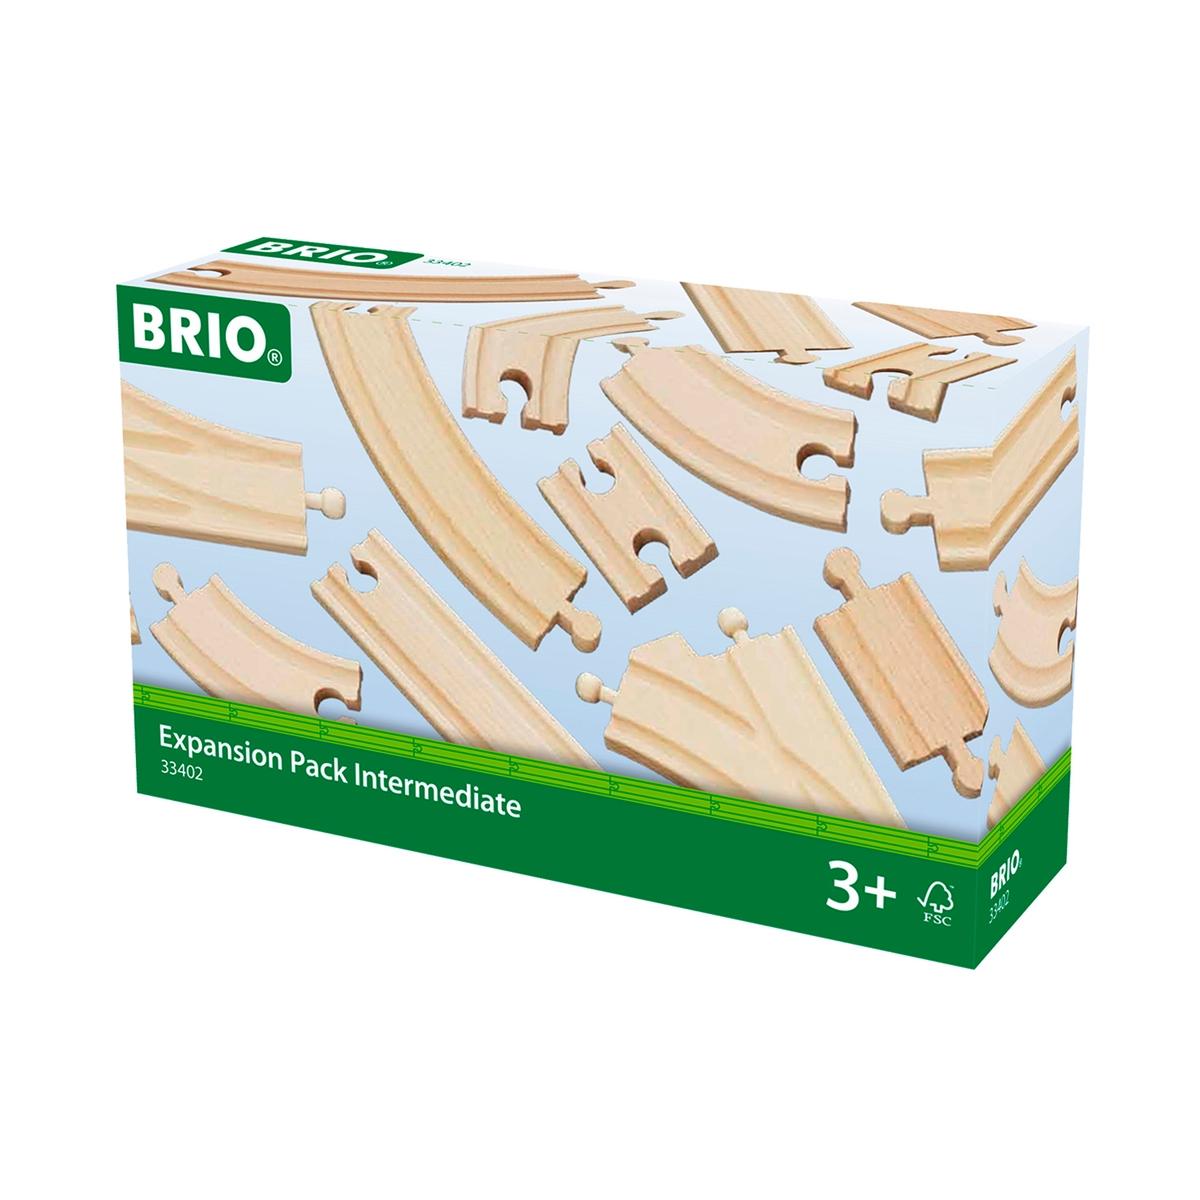 An image of Brio 16 Rail Intermediate Expansion Kit